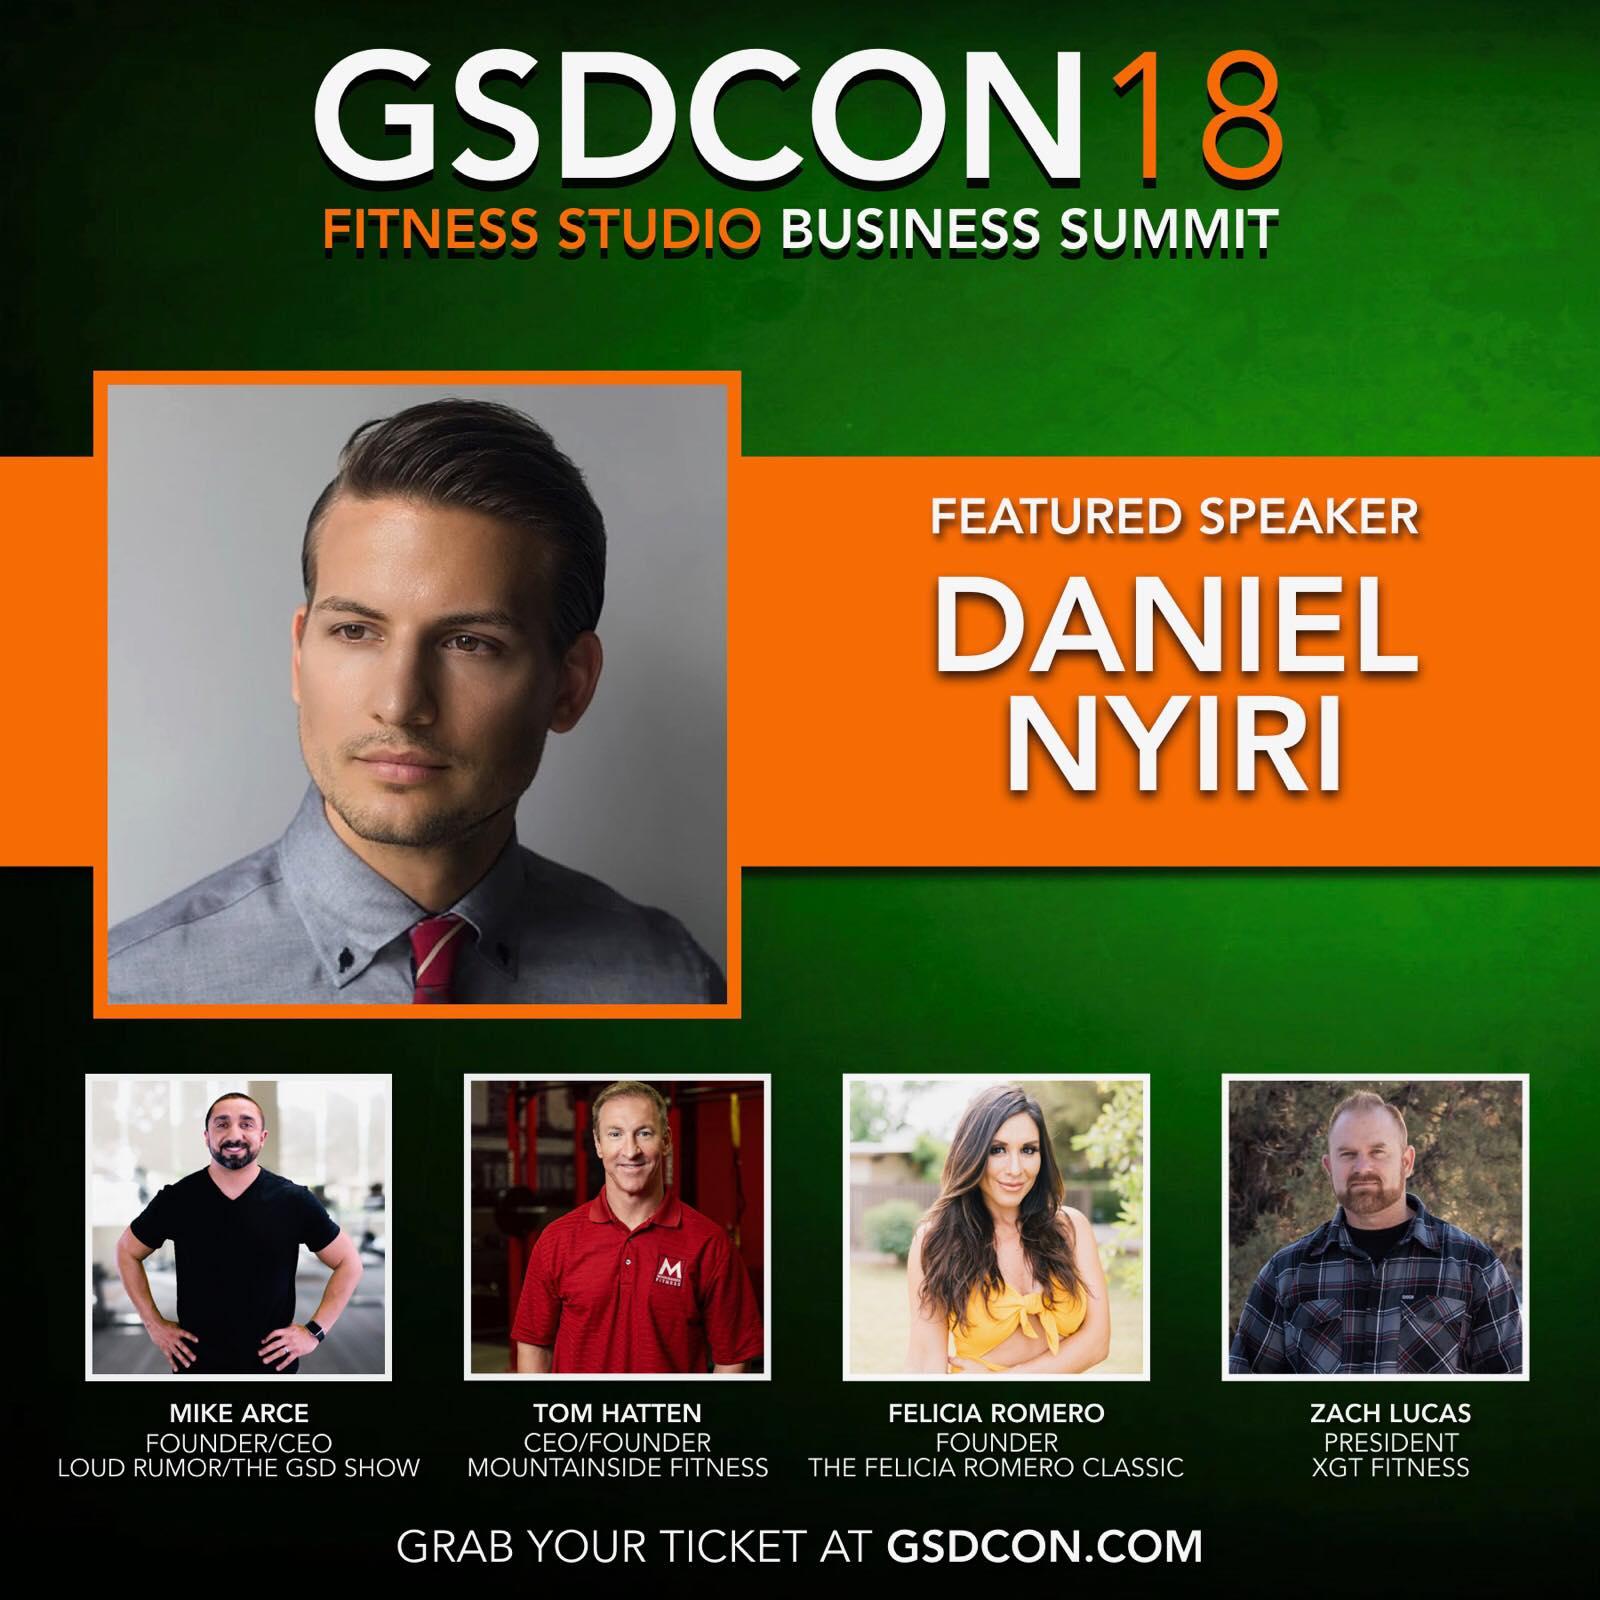 Daniel nyiri speaker author entrepreneur ceo